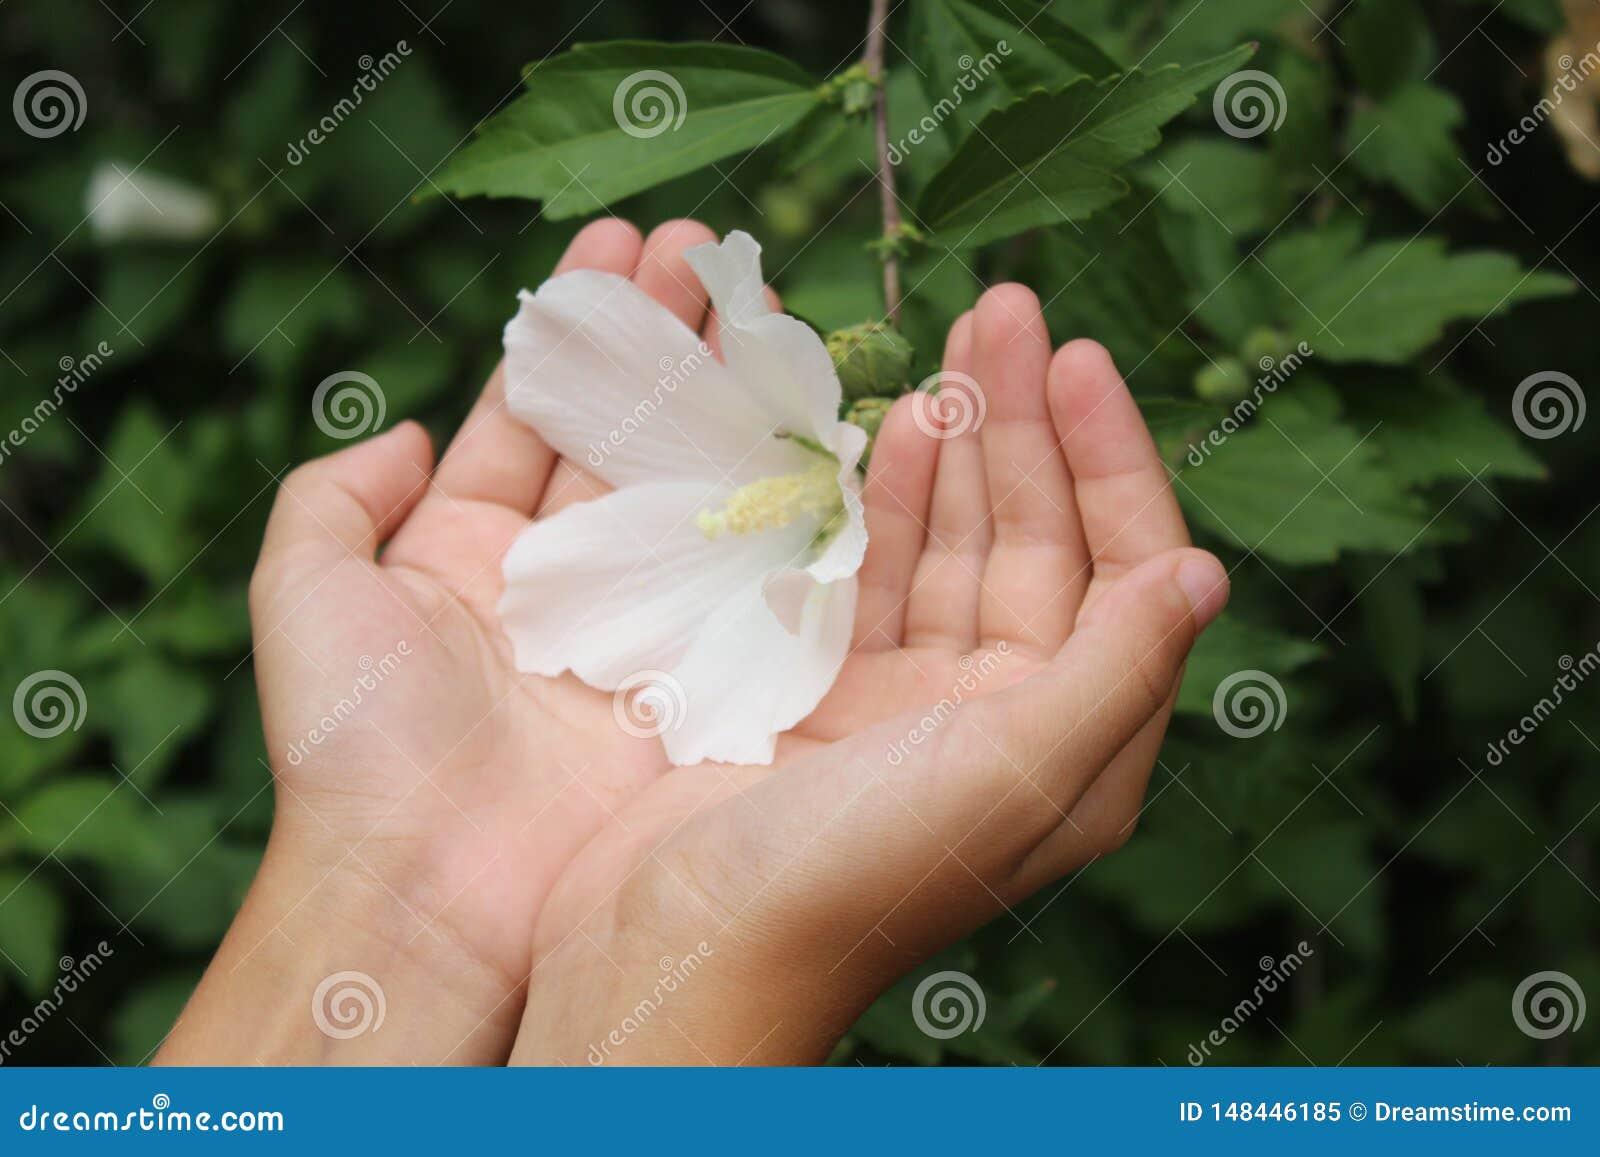 Beautiful flower in hand